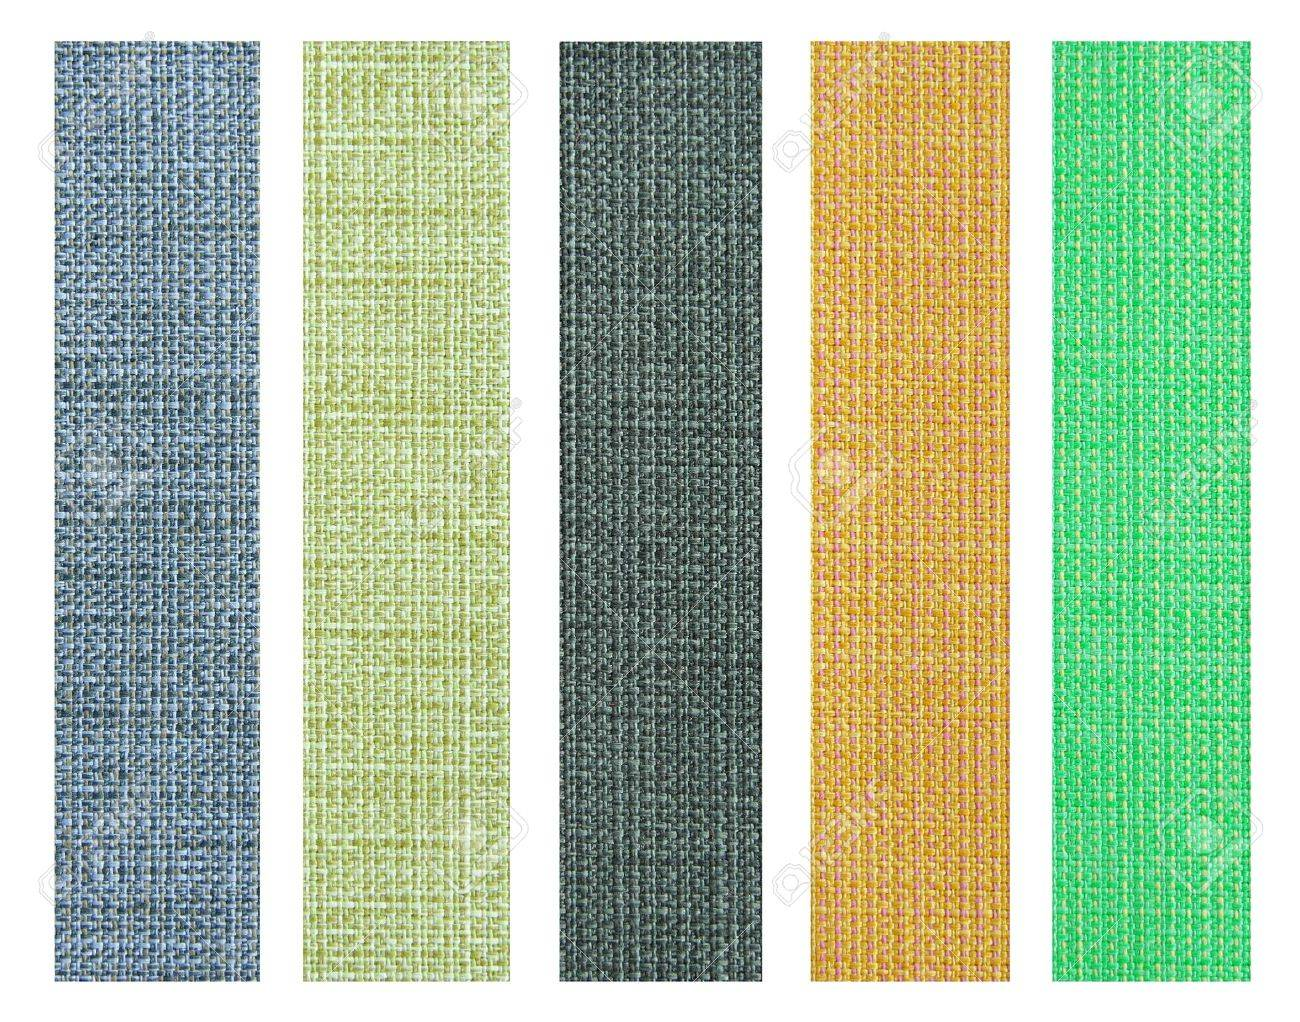 Fabric For Interior Design color fabric texture sample for interior design stock photo